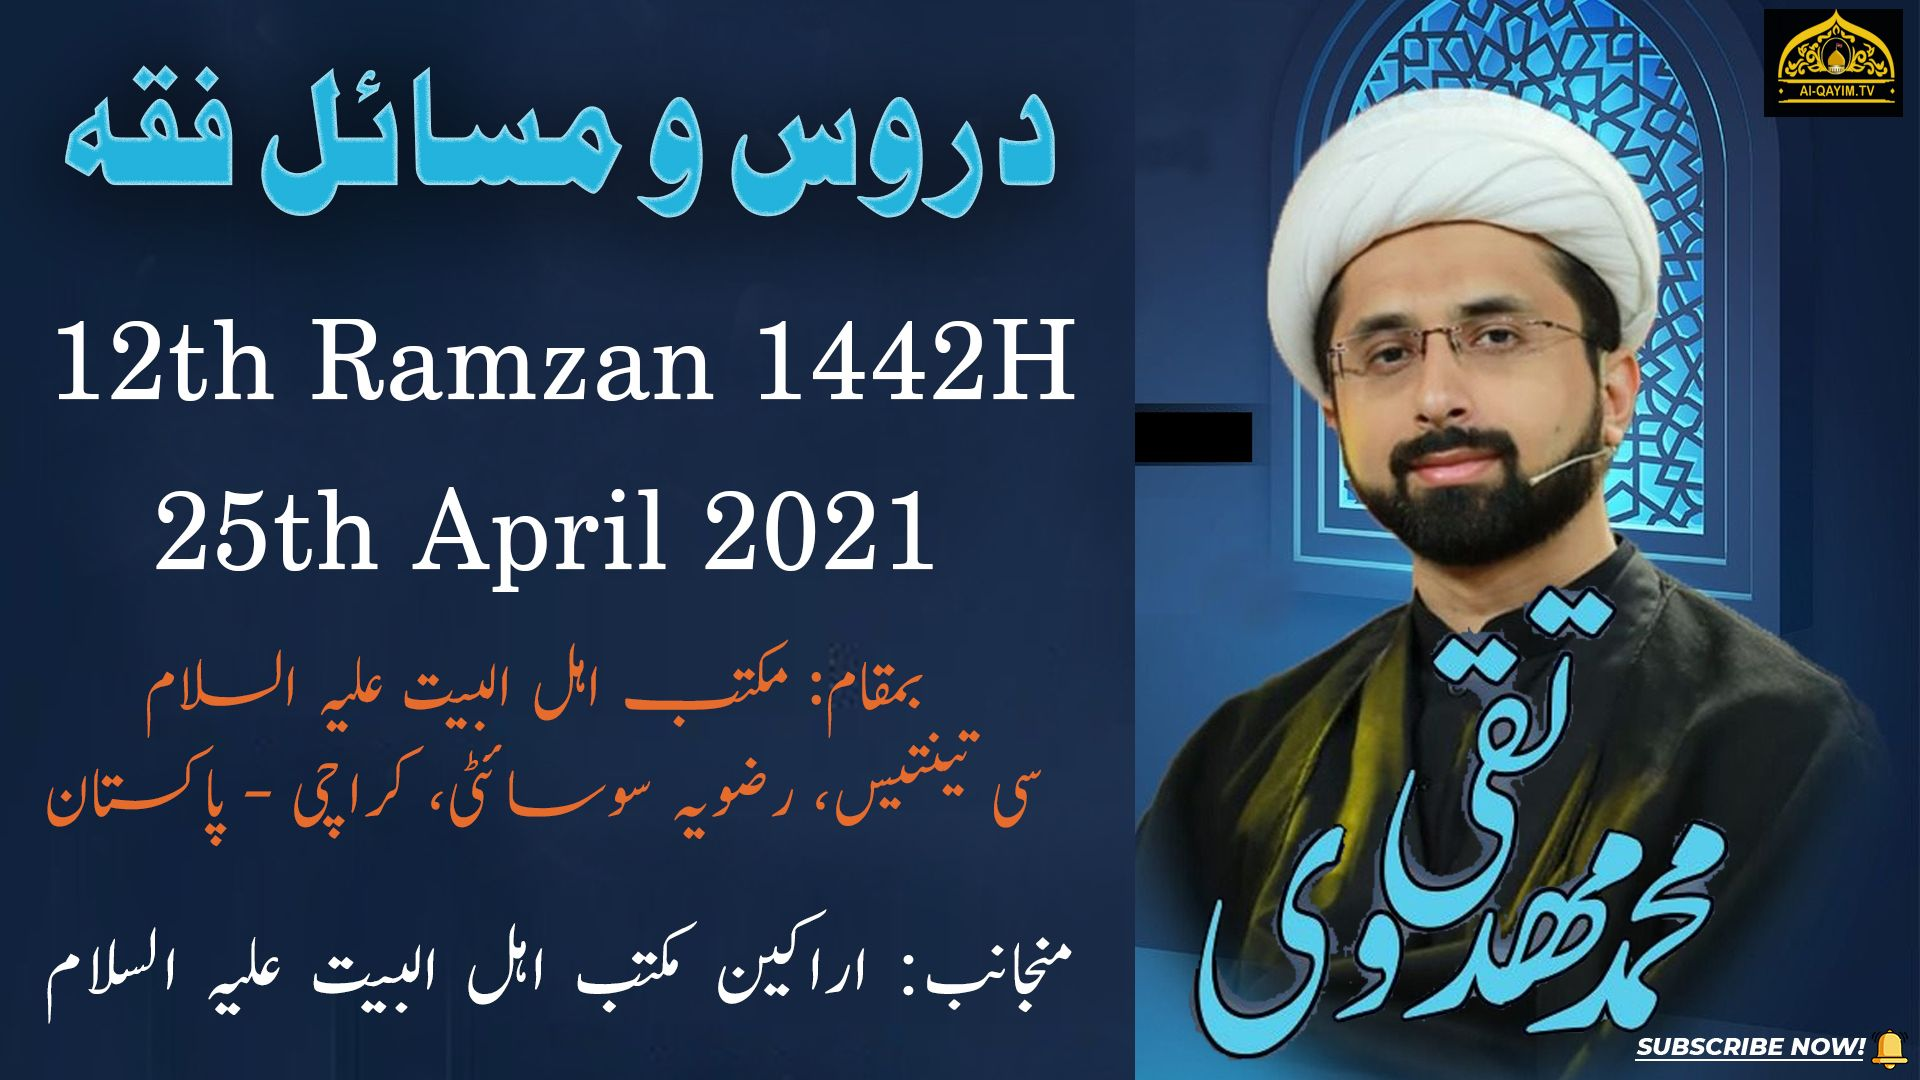 Moulana Muhammad Taqi Mehdavi | Dars Wo Masail Fiqae | 12th Ramzan 2021 | Maktab-e-Ahlebait, Karachi